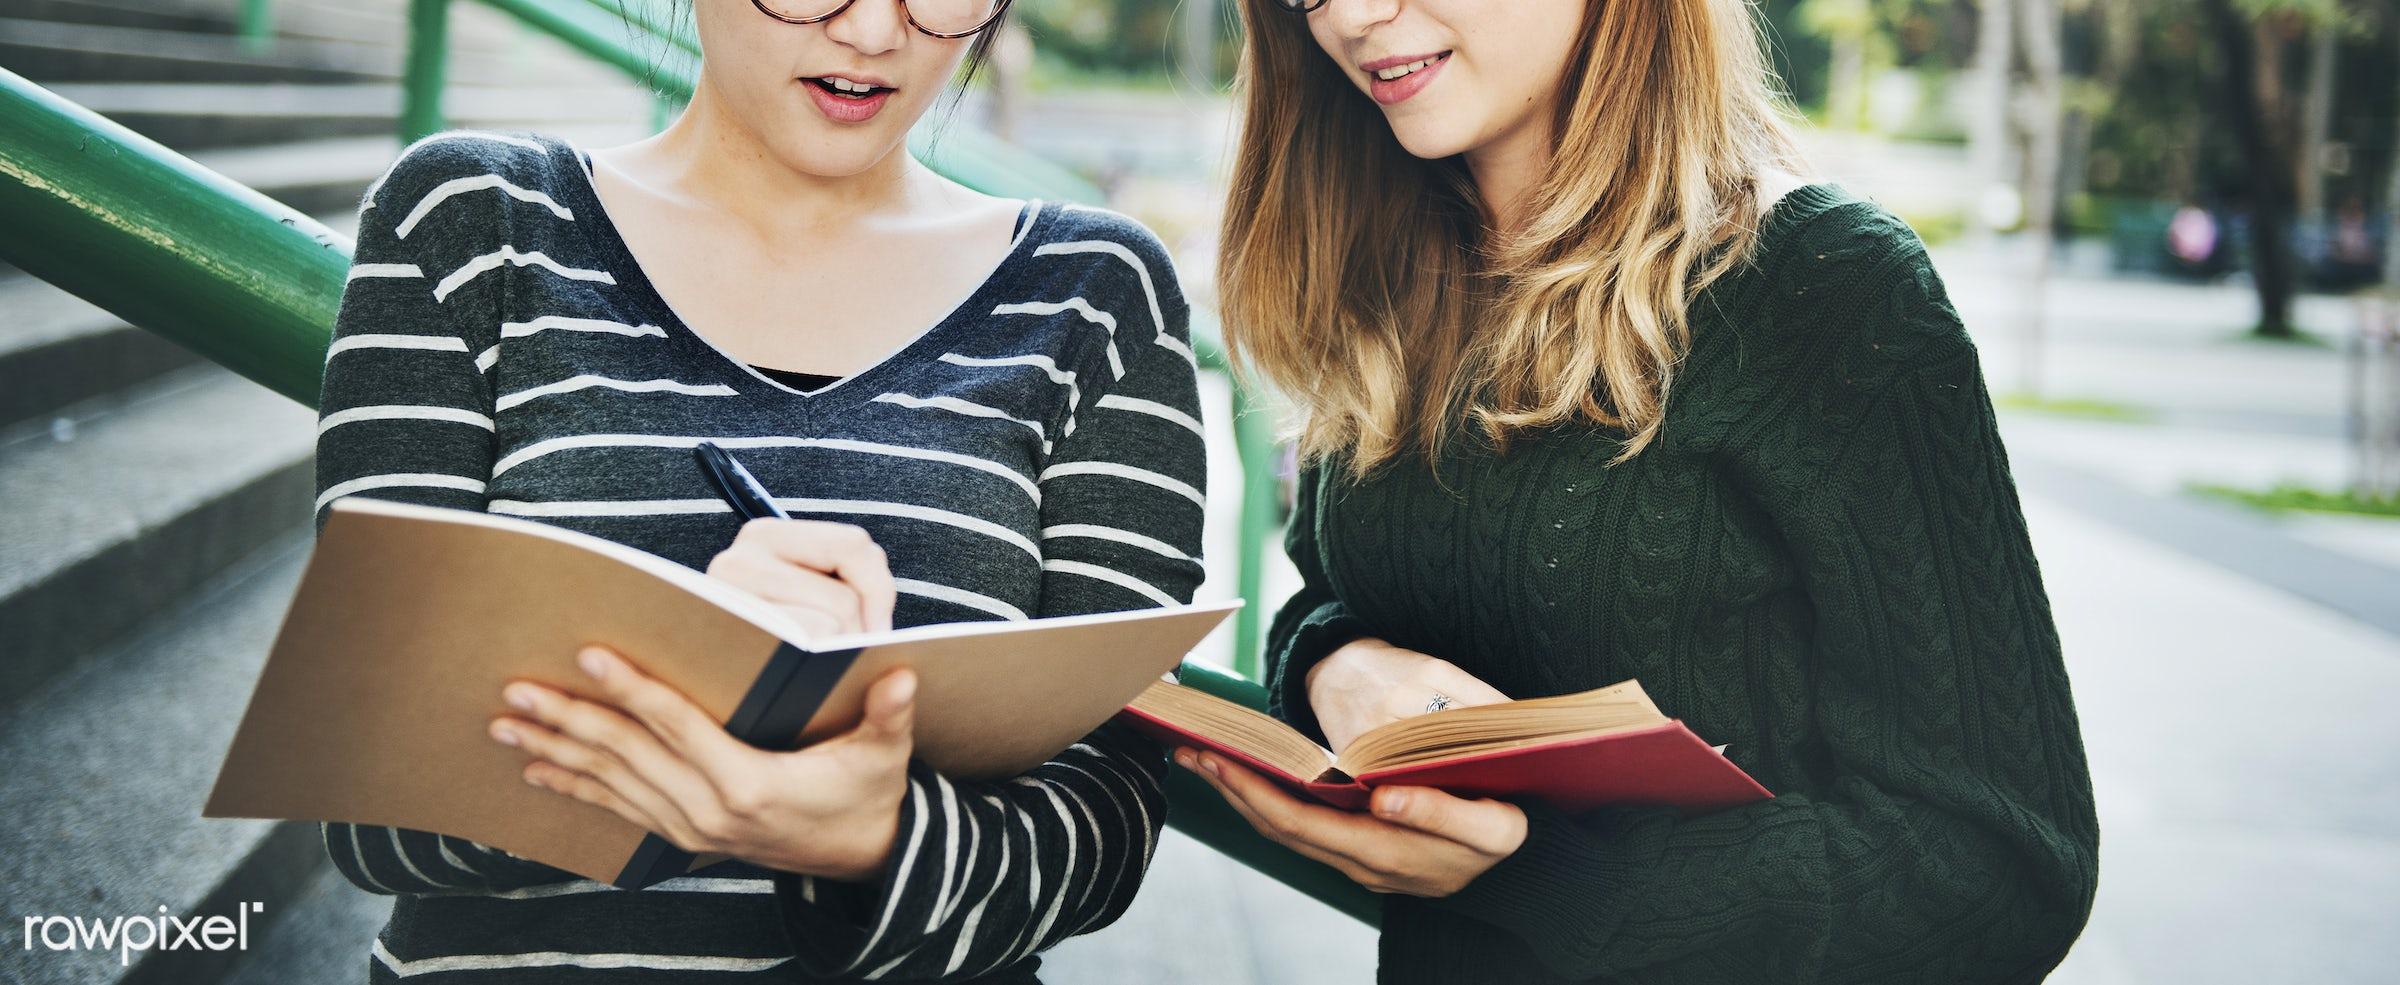 caucasian, analysing, analysis, asian, bonding, book, brainstorming, campus, casual, college, communication, conversation,...